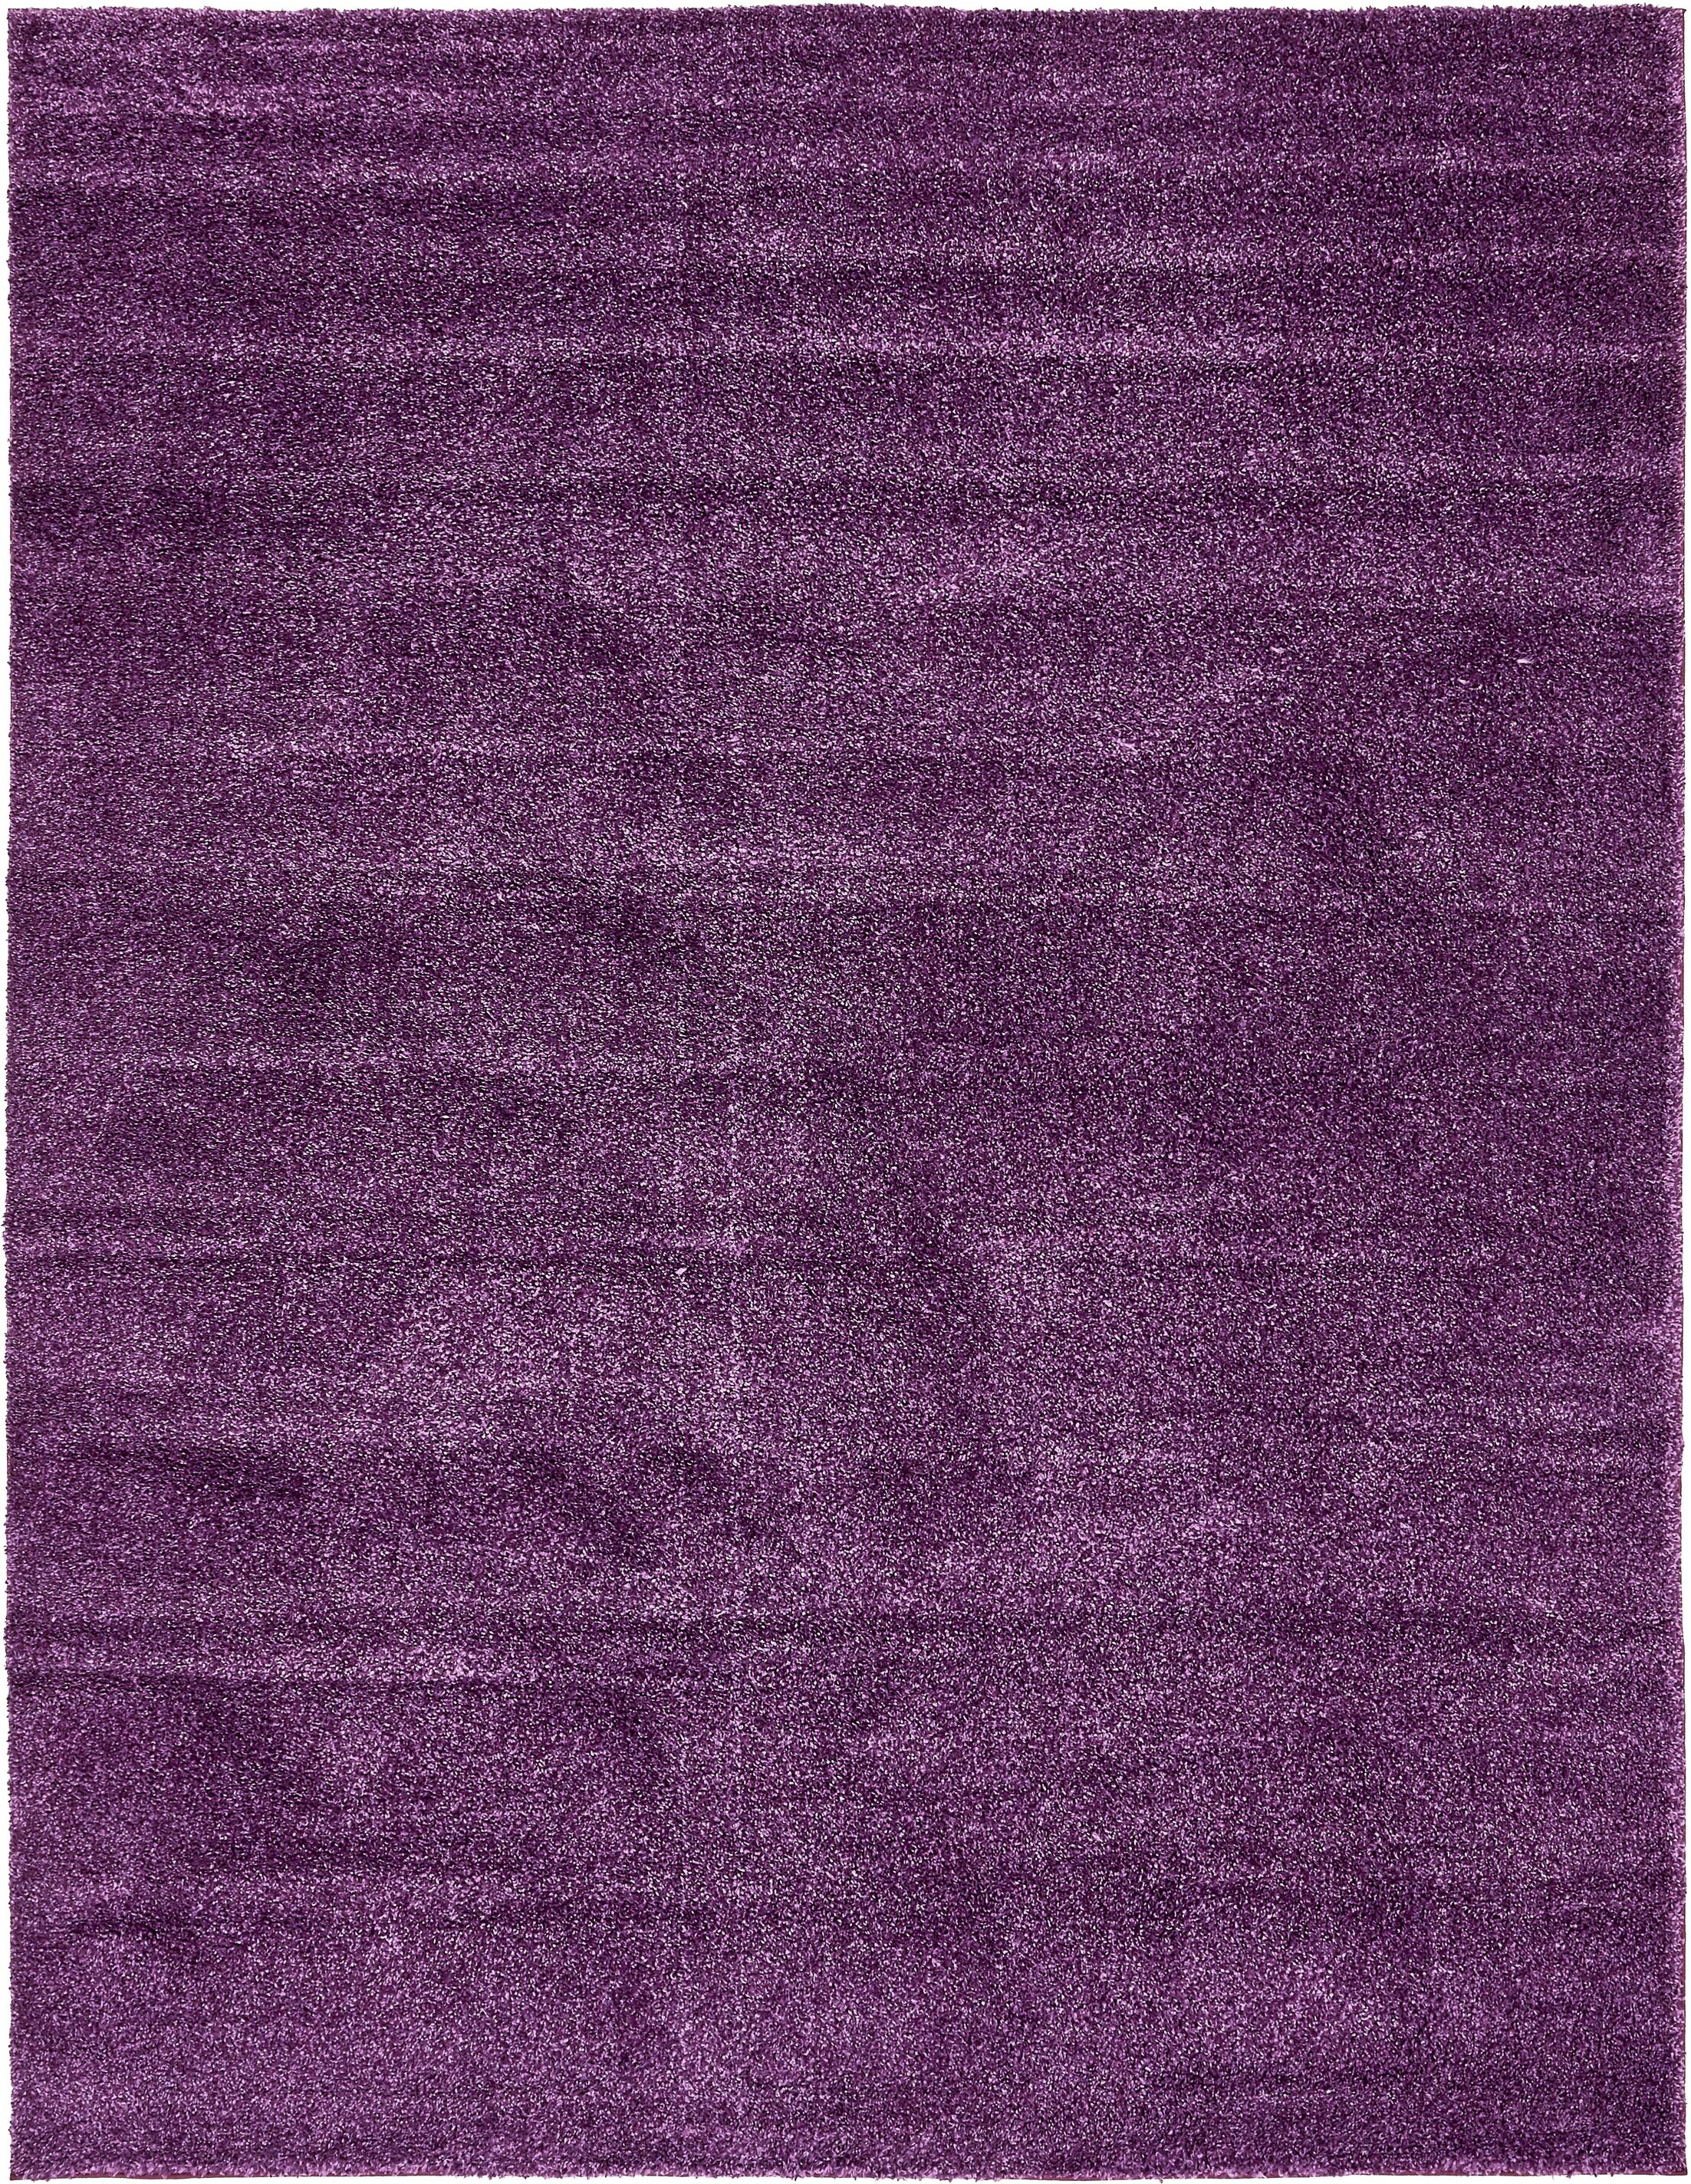 Truett Violet Area Rug Rug Size: Rectangle 10' x 13'